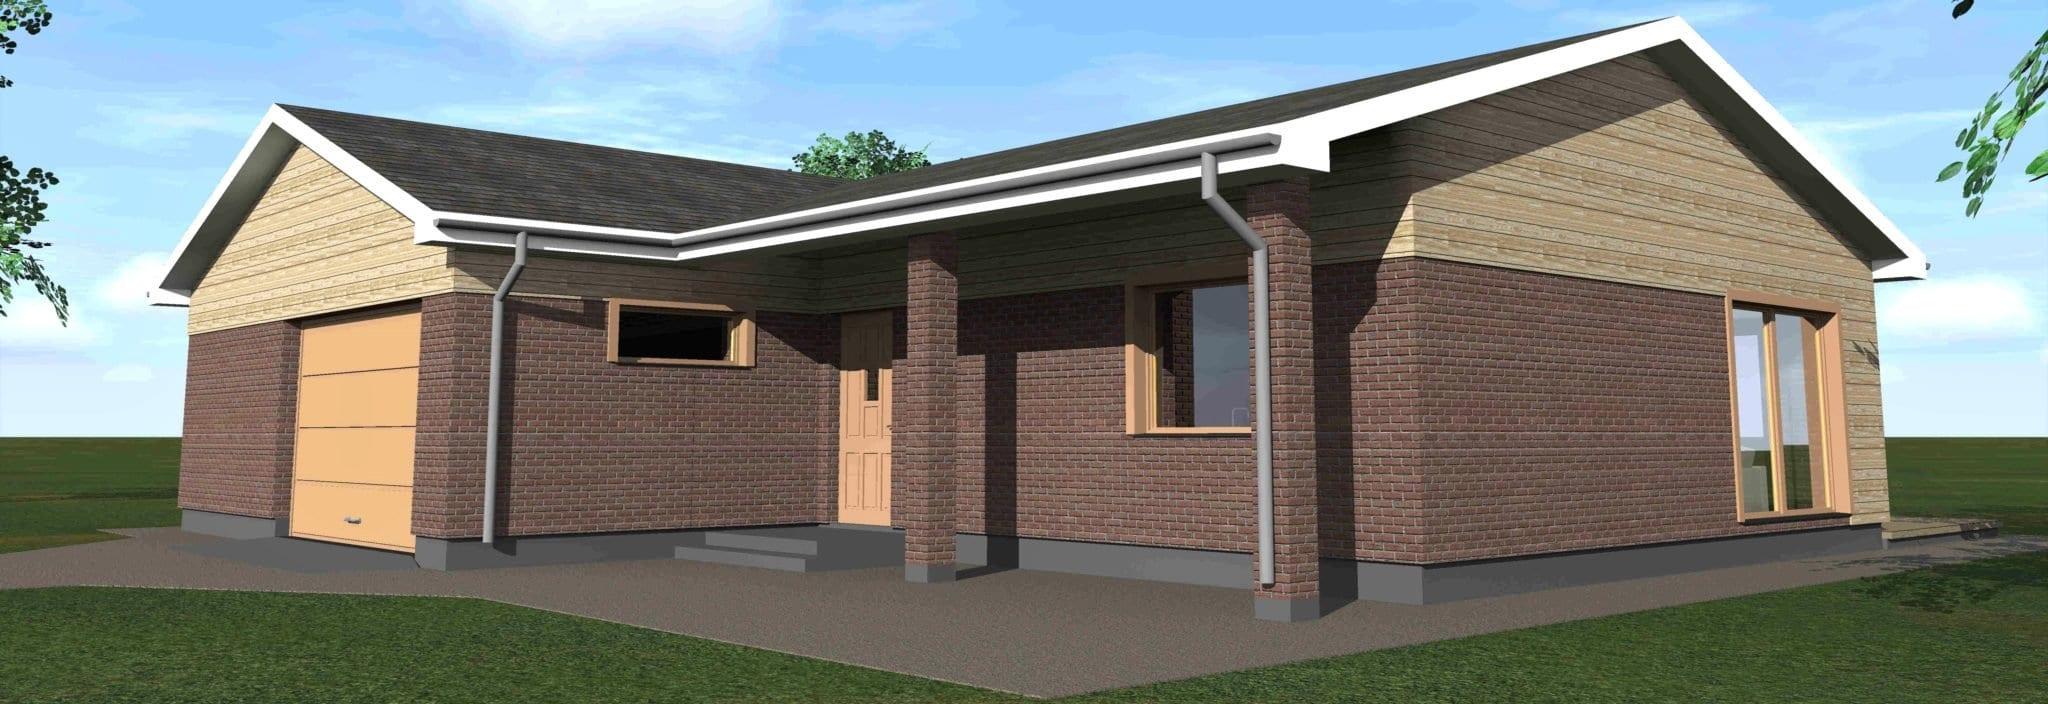 Vienbučio gyvenamojo namo projektas vizualacija